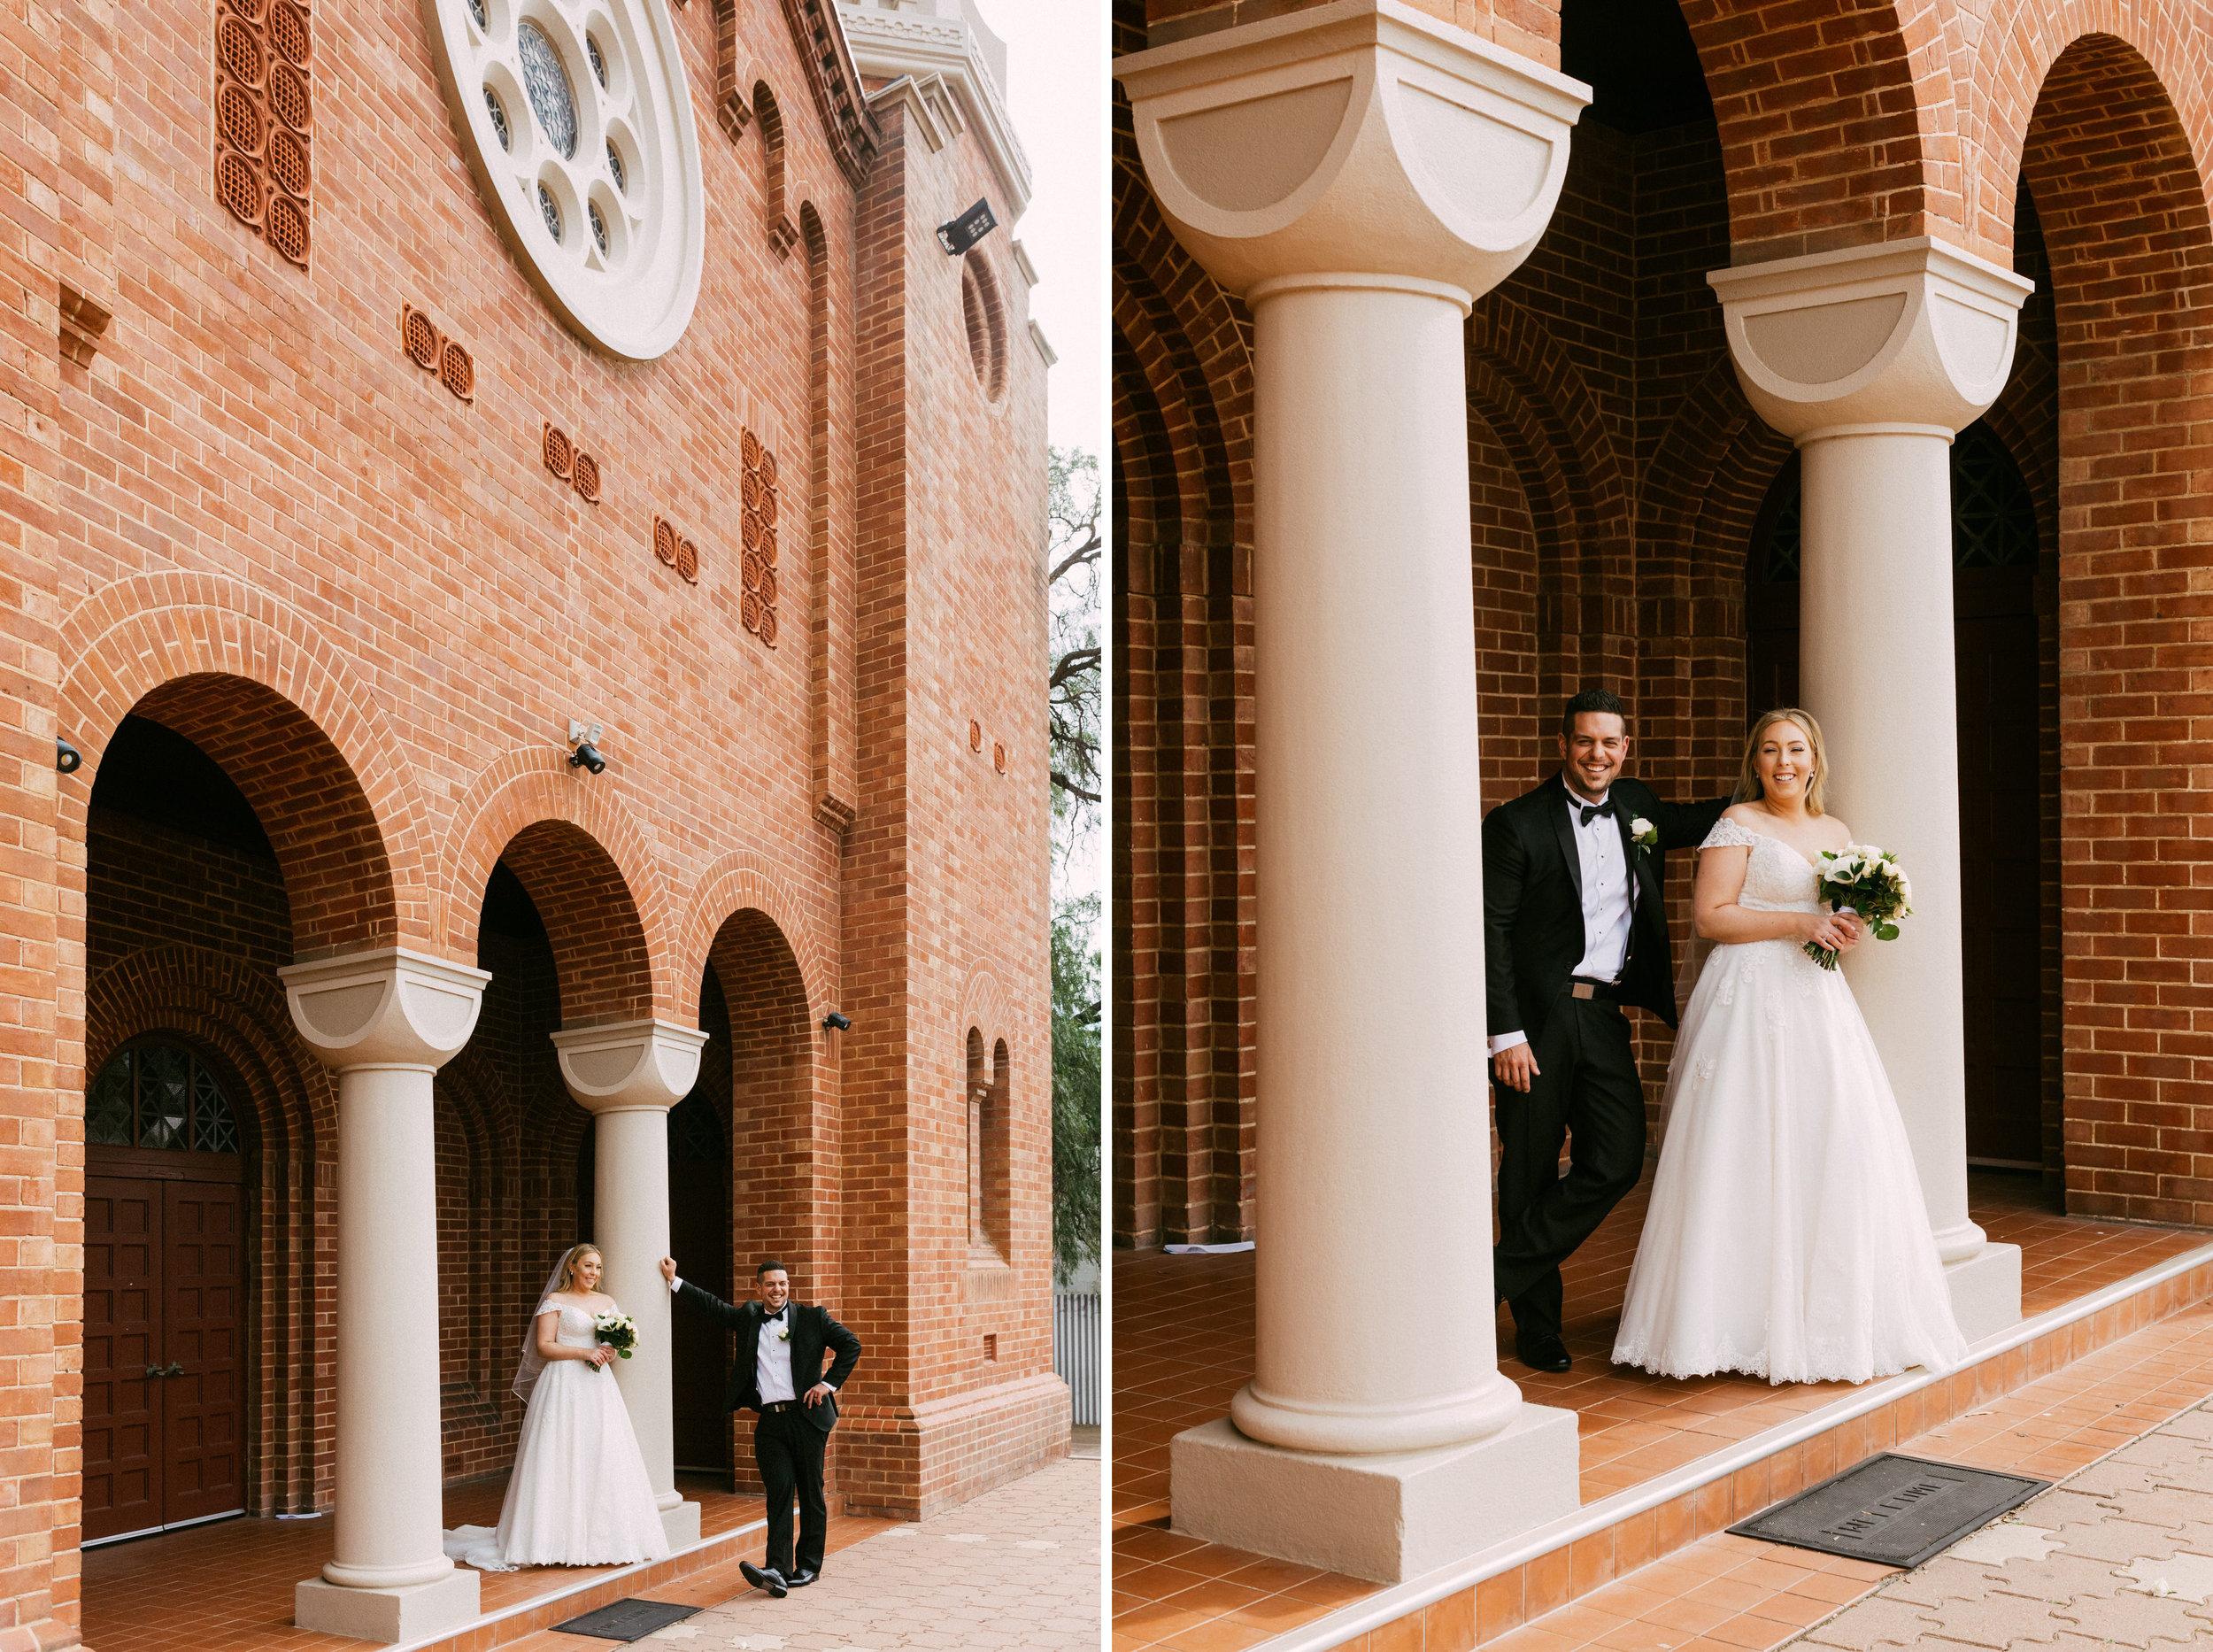 Adelaide Wedding Church Smoke Bomb Serafino 085.jpg